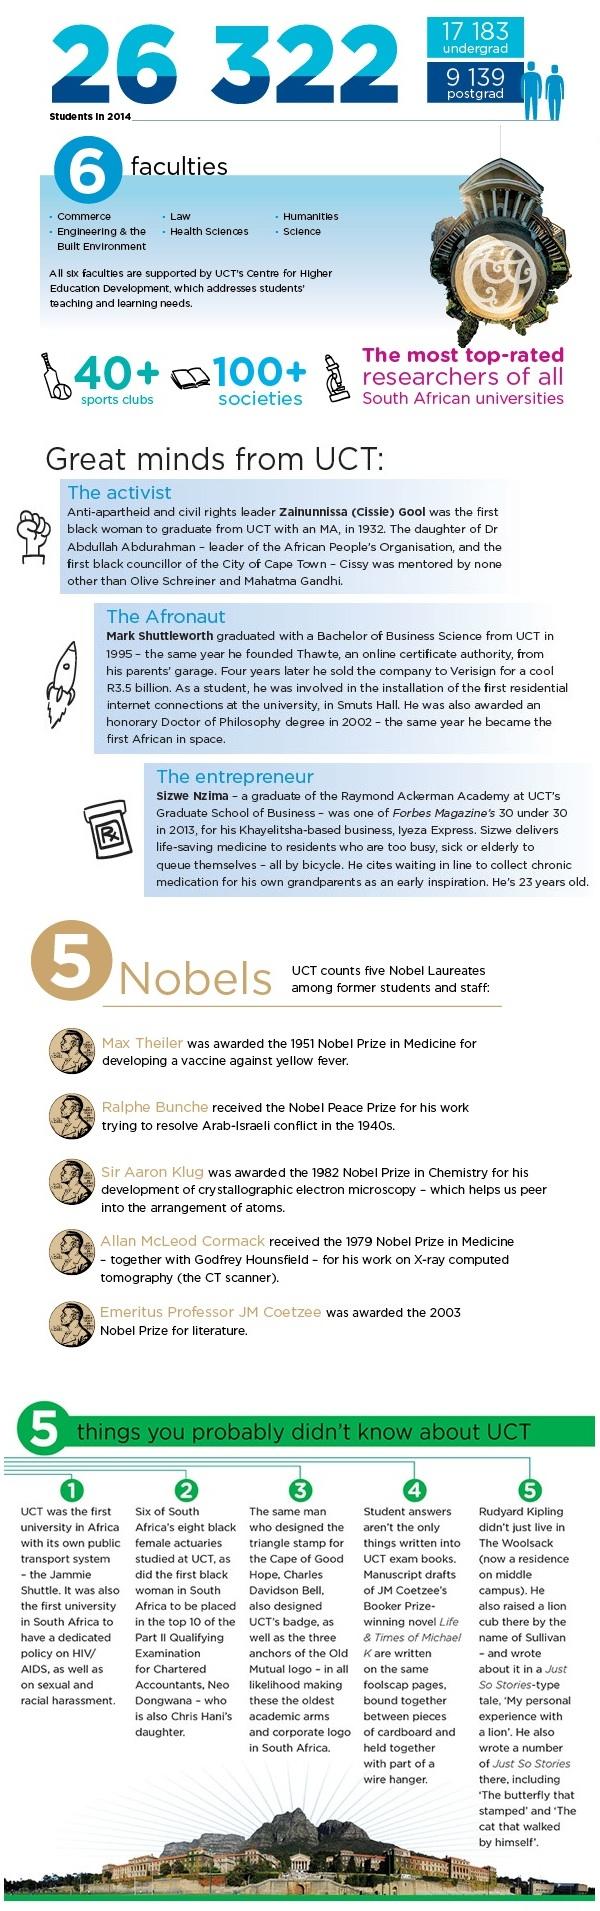 UCT-infographic